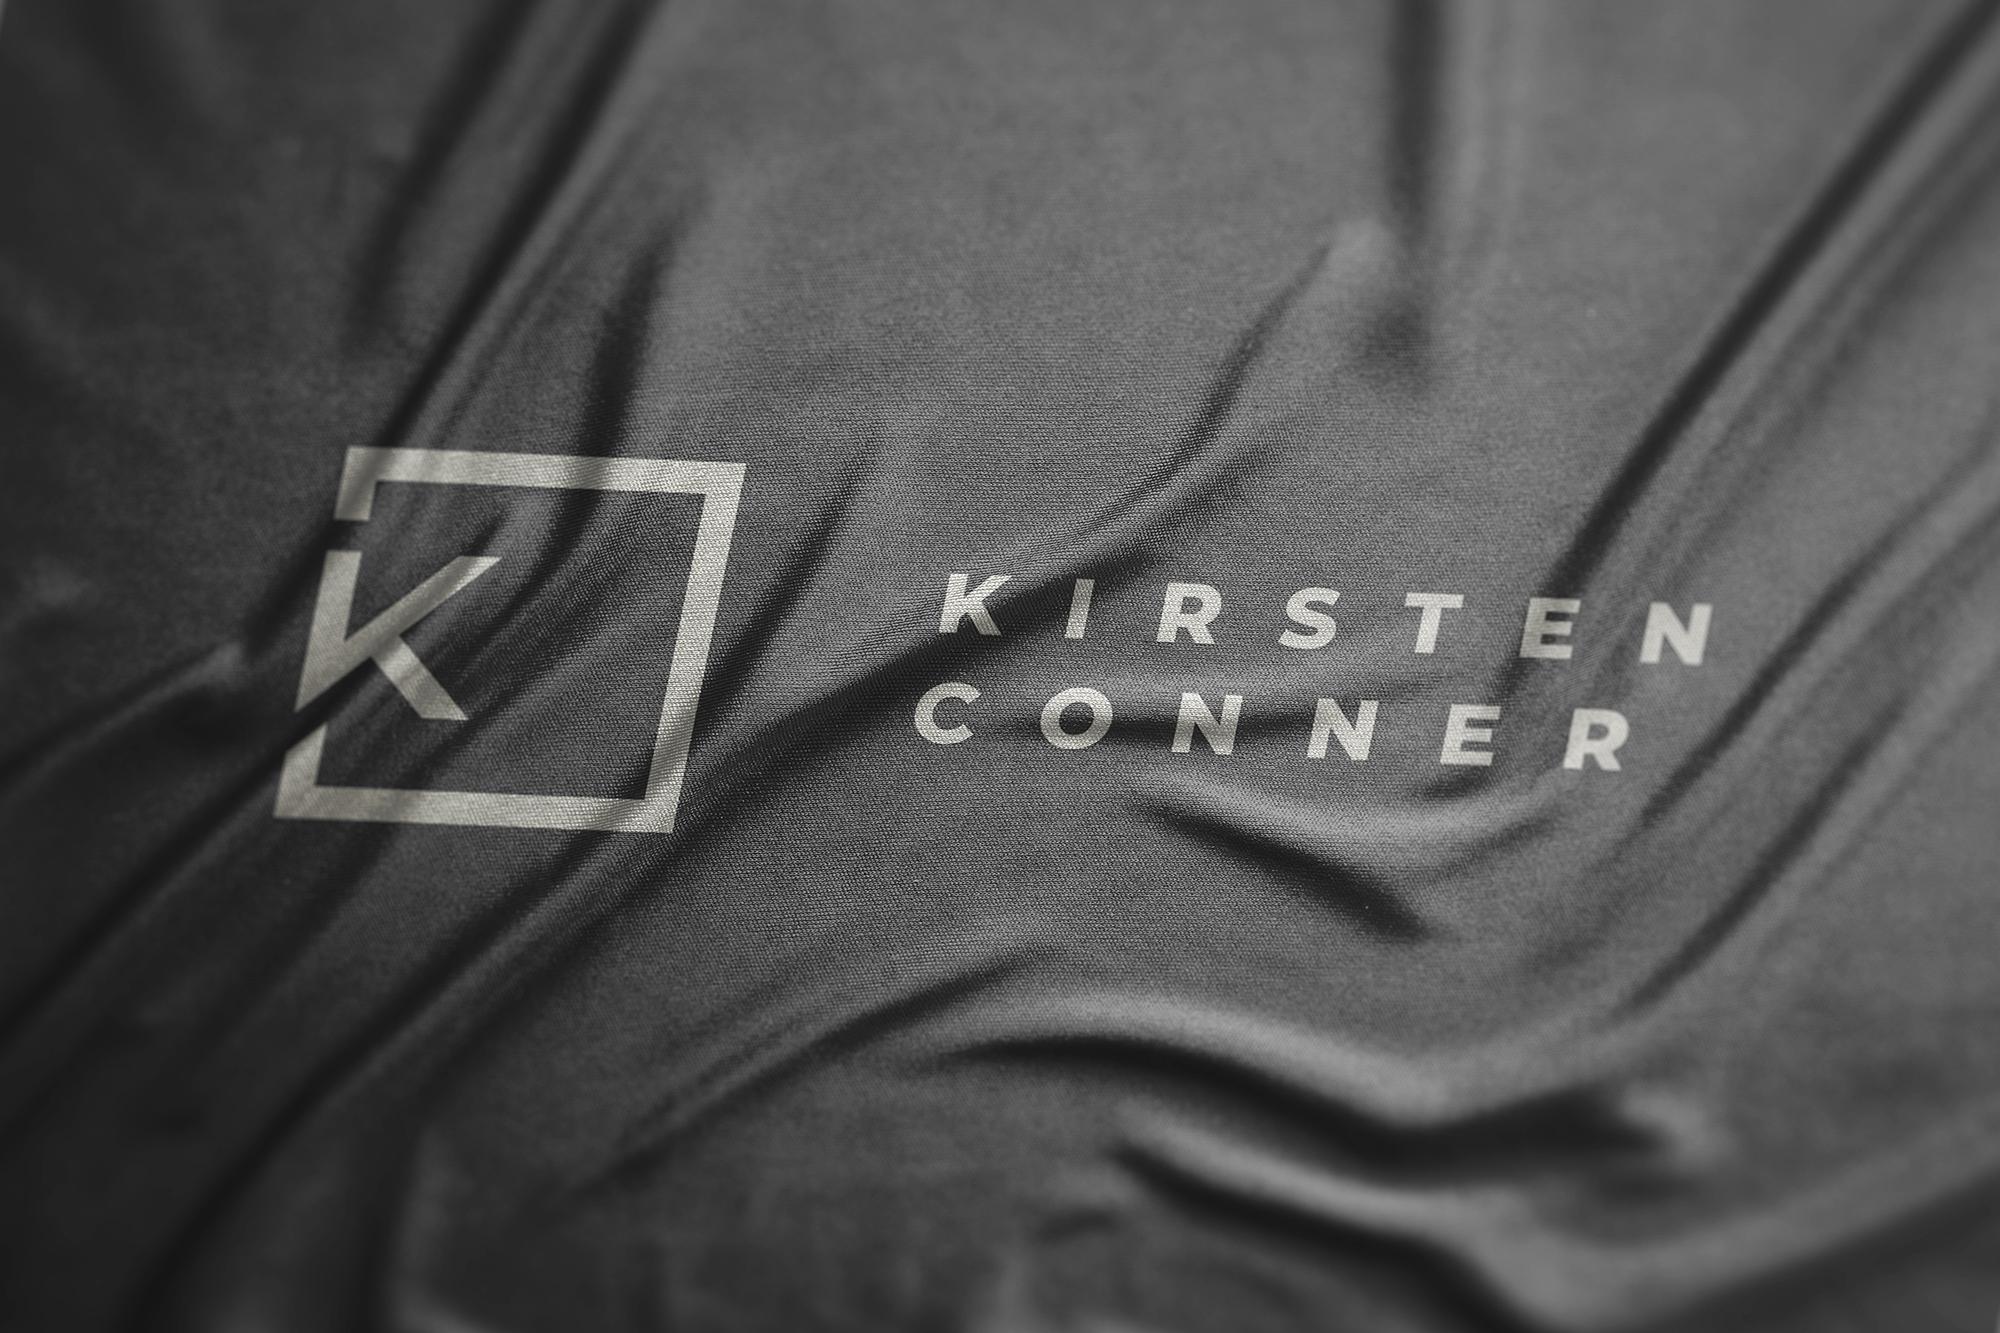 Kirsten Conner logo fabric